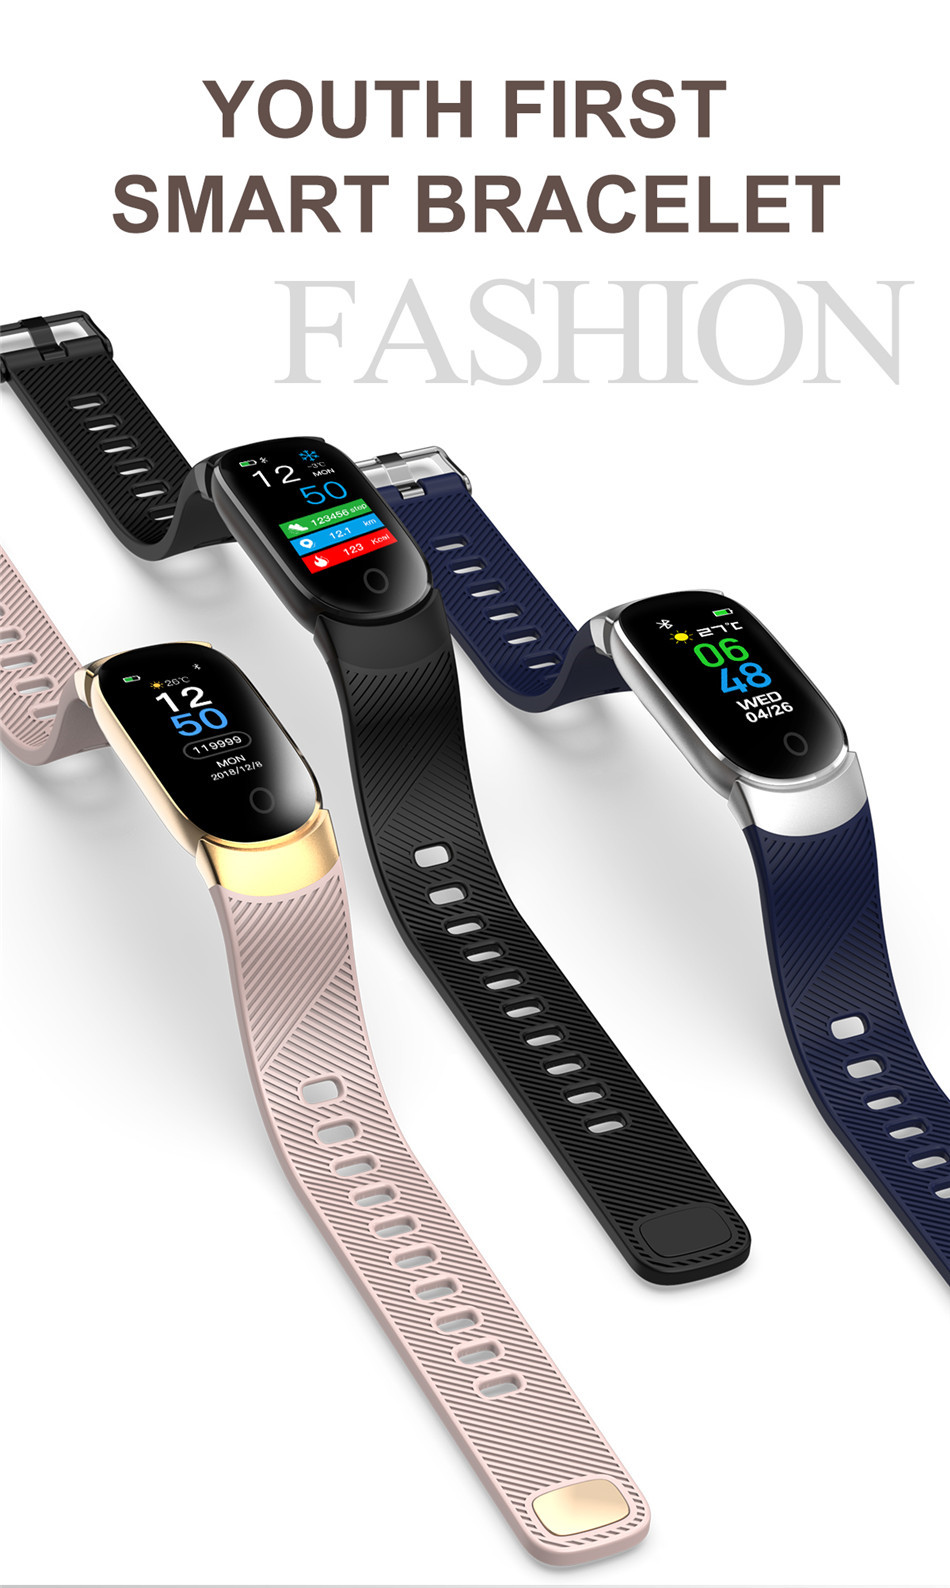 HTB1IIhvaELrK1Rjy1zbq6AenFXaz LIGE Sport Smart Bracelet Women Men Waterproof Smart Watch Heart Rate Blood Pressure Pedometer Smart Wristband For Android iOS